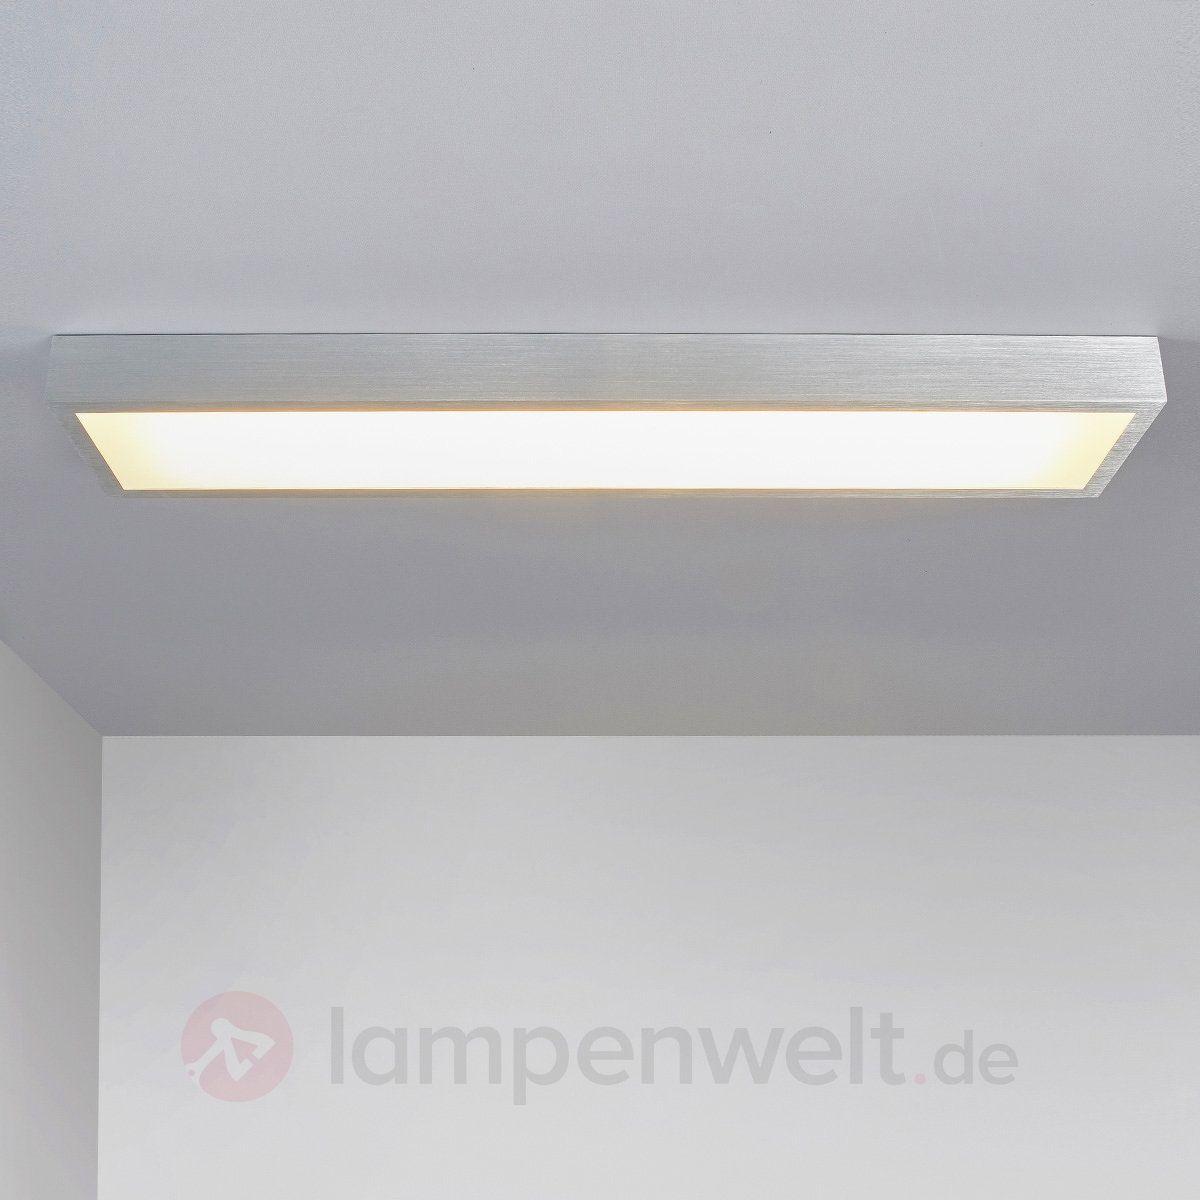 Esila  LEDDeckenleuchte  Lampen  Deckenlampe kche Led deckenleuchte und Deckenleuchte